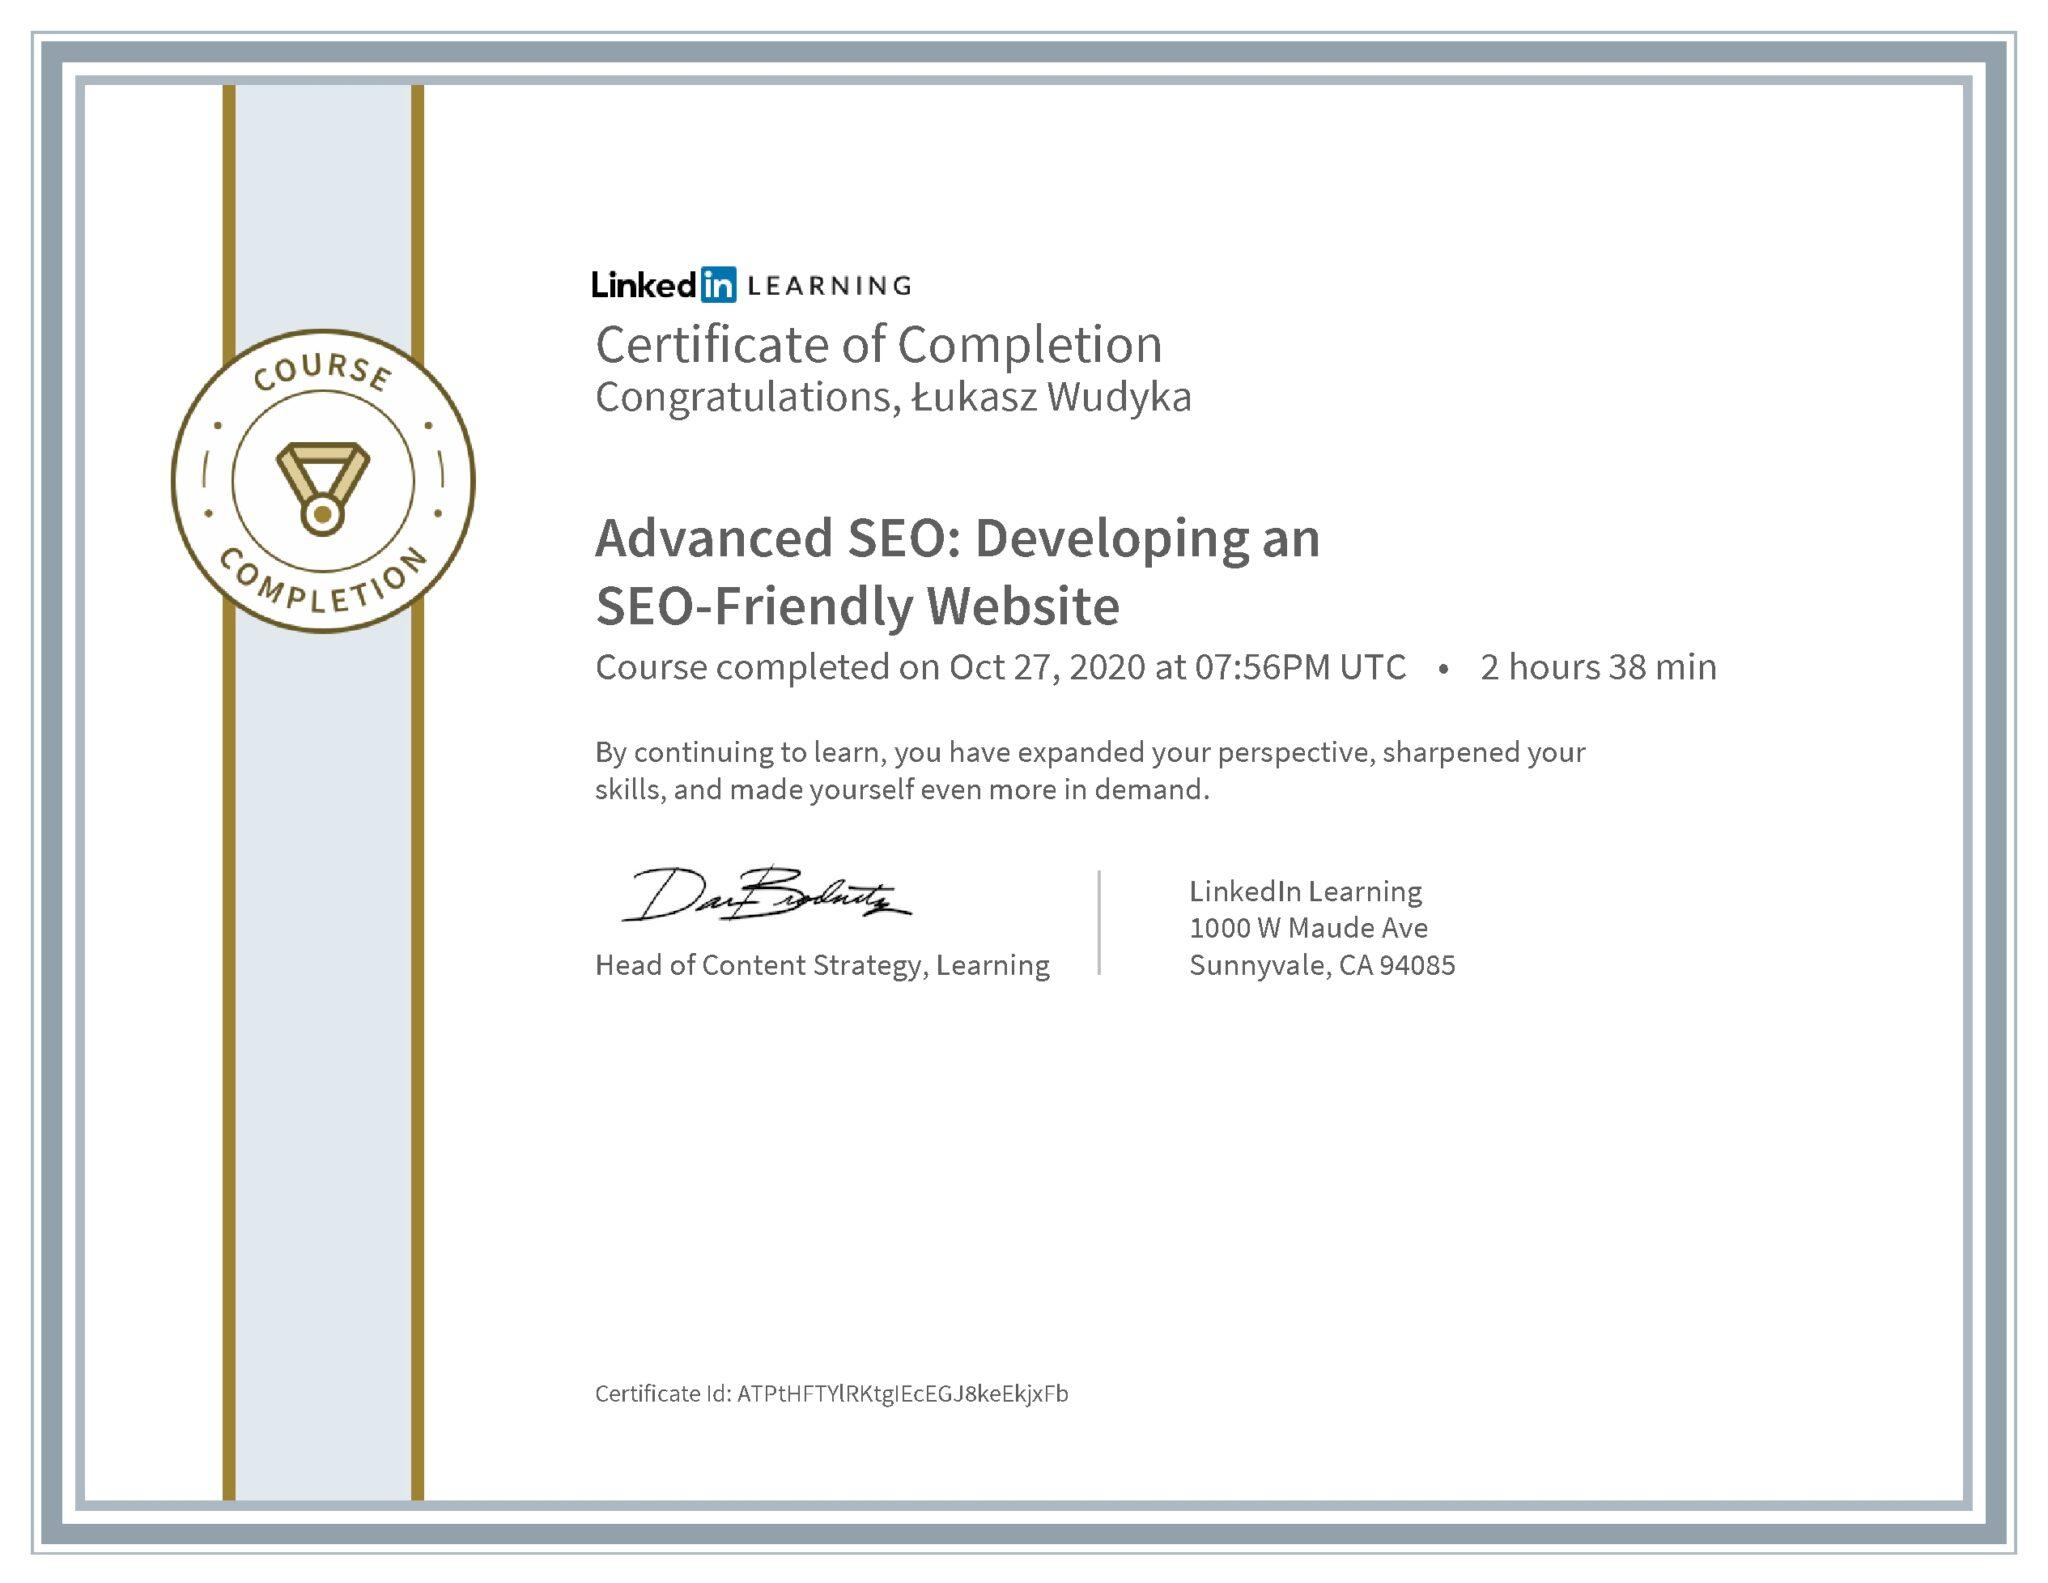 Łukasz Wudyka certyfikat LinkedIn Advanced SEO: Developing an SEO-Friendly Website